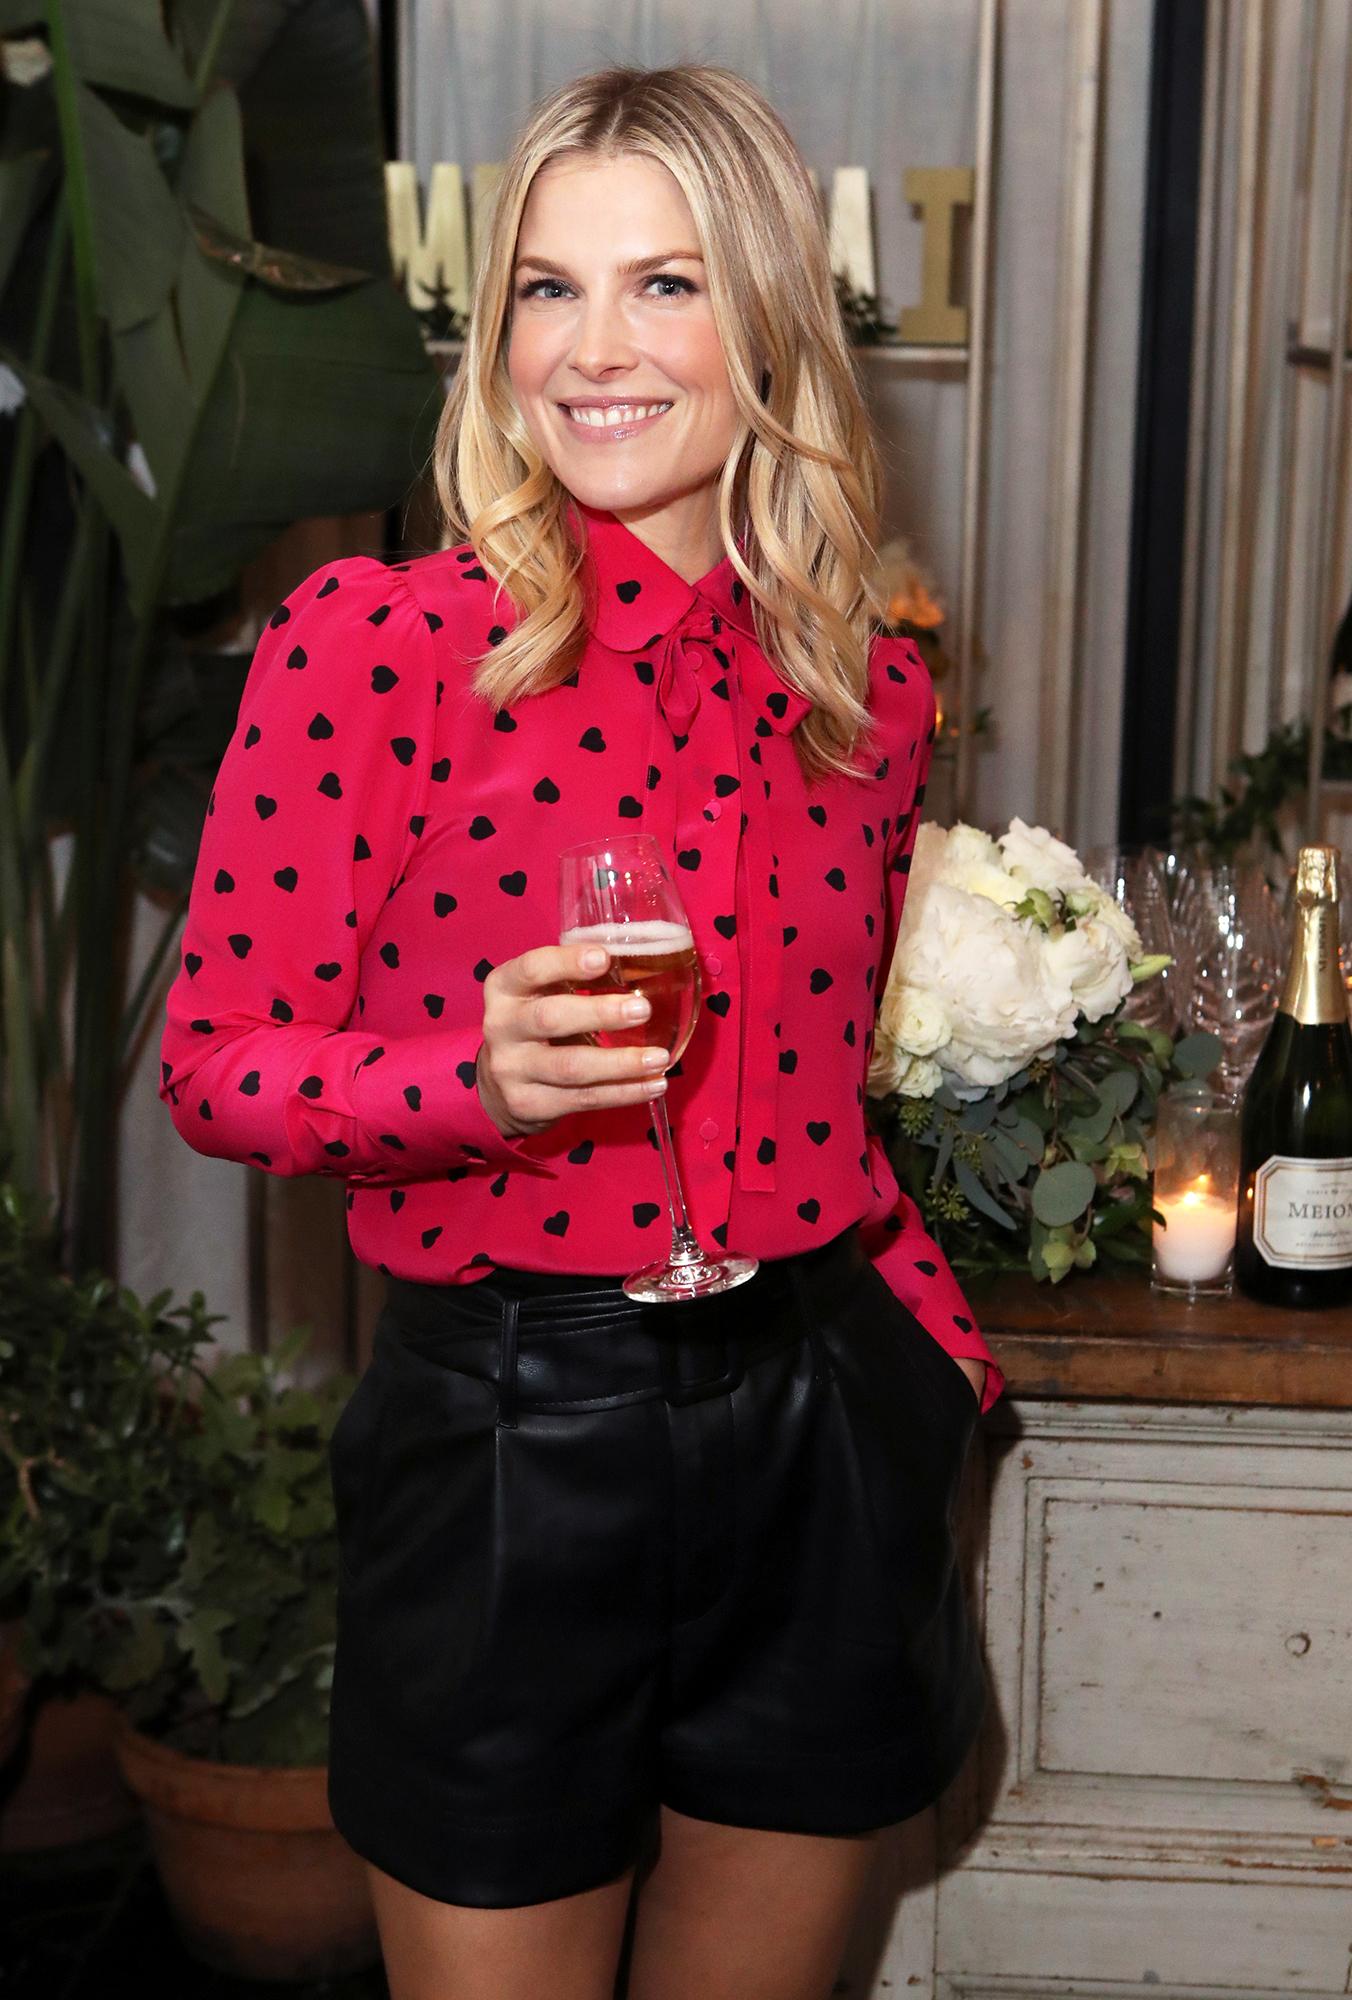 Ali Larter Shares Holiday Recipe for Fa La La Fondue, Which Pairs Perfectly With Wine - Ali Larter